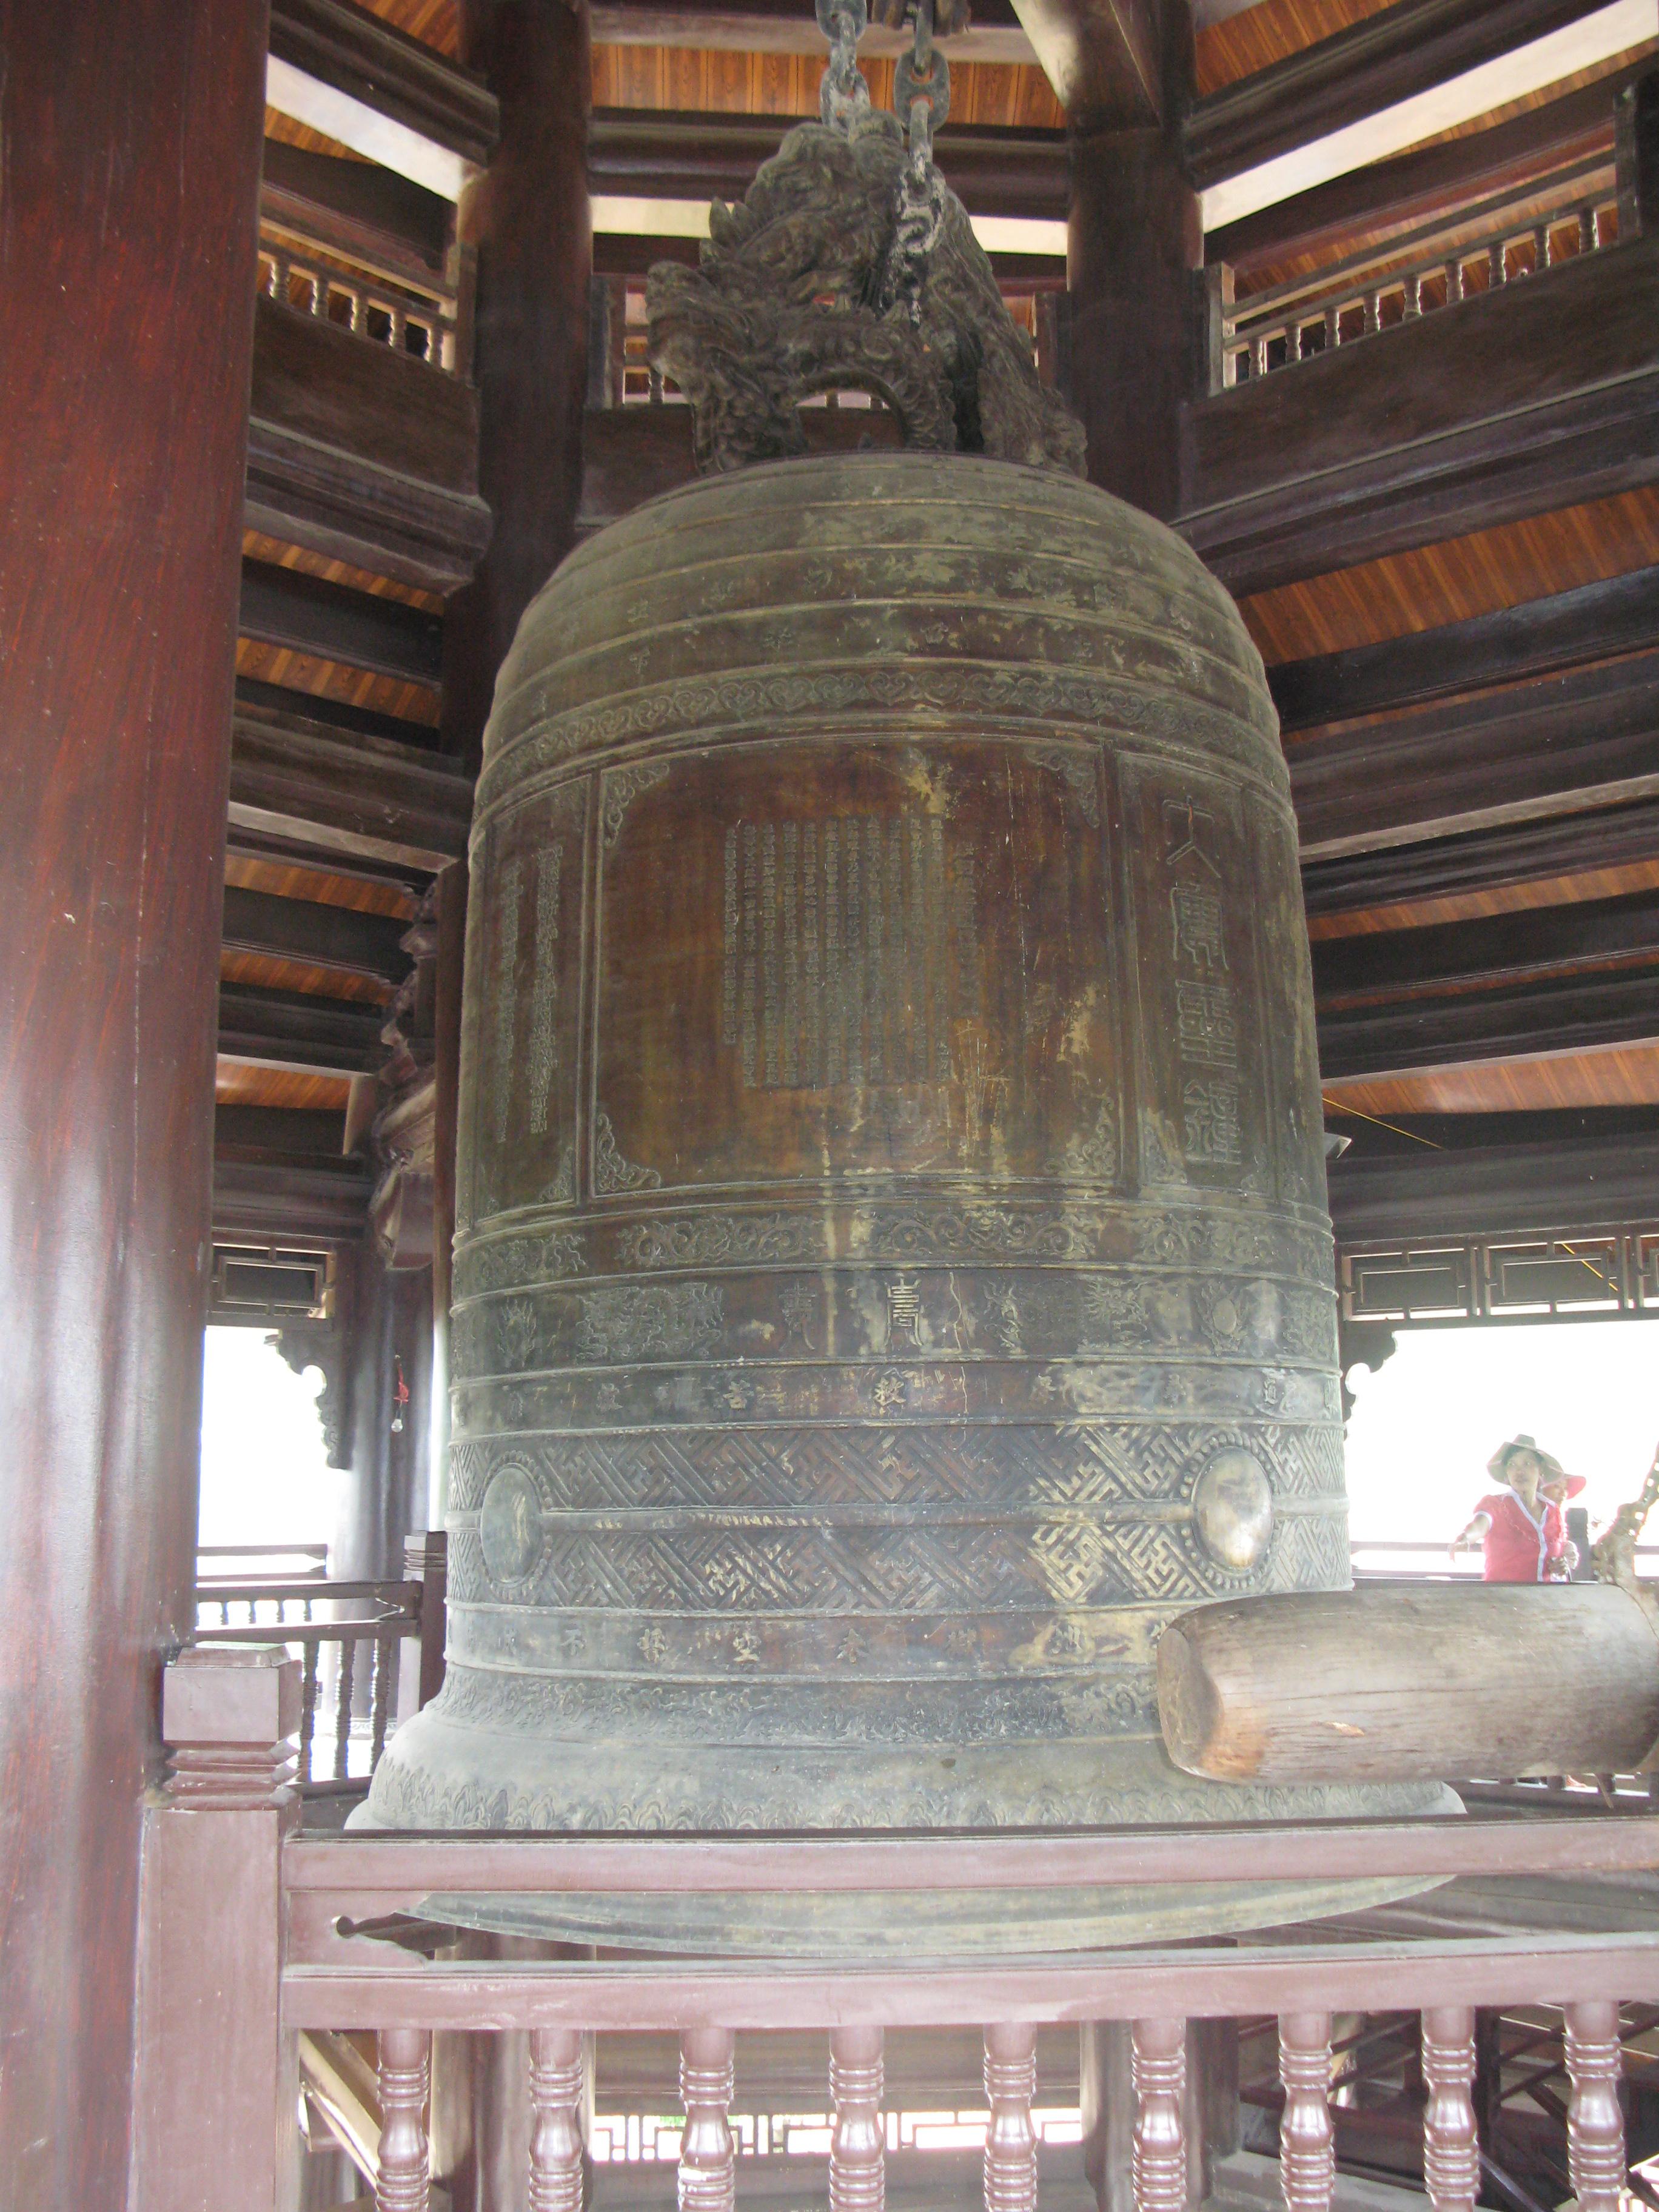 https://upload.wikimedia.org/wikipedia/commons/b/bc/BaiDinh_Chuong.JPG